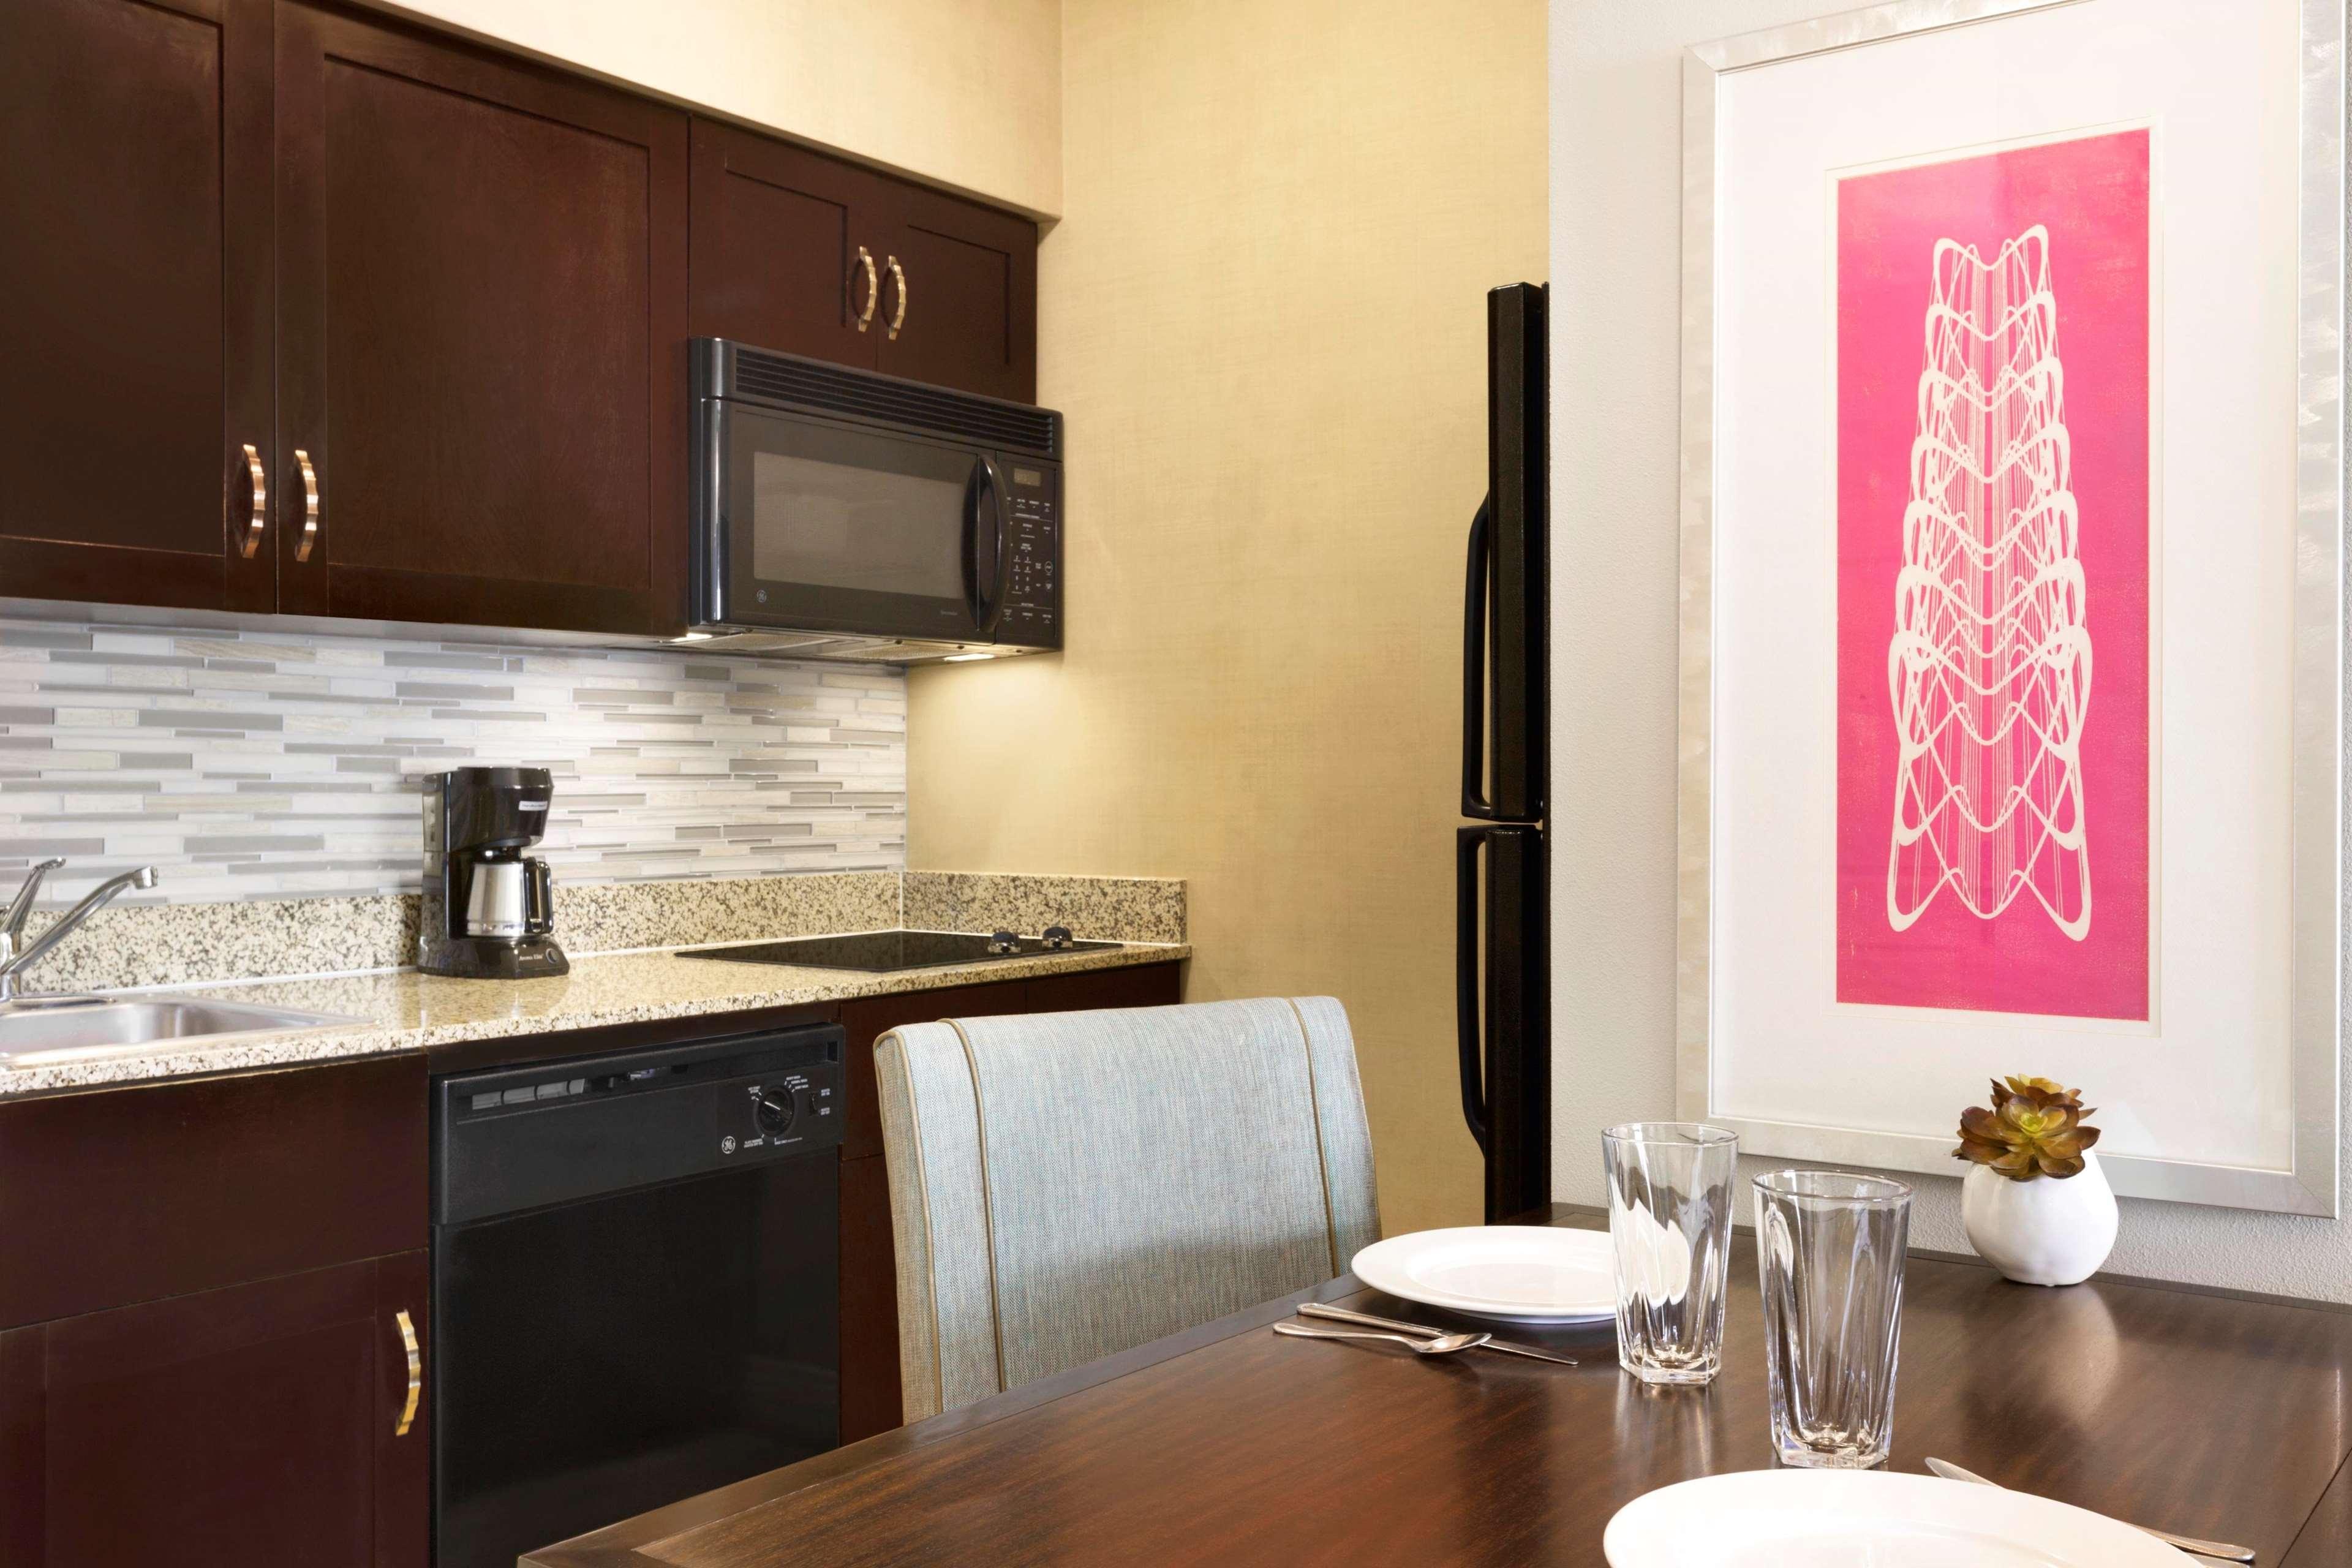 Homewood Suites by Hilton Plano-Richardson image 14